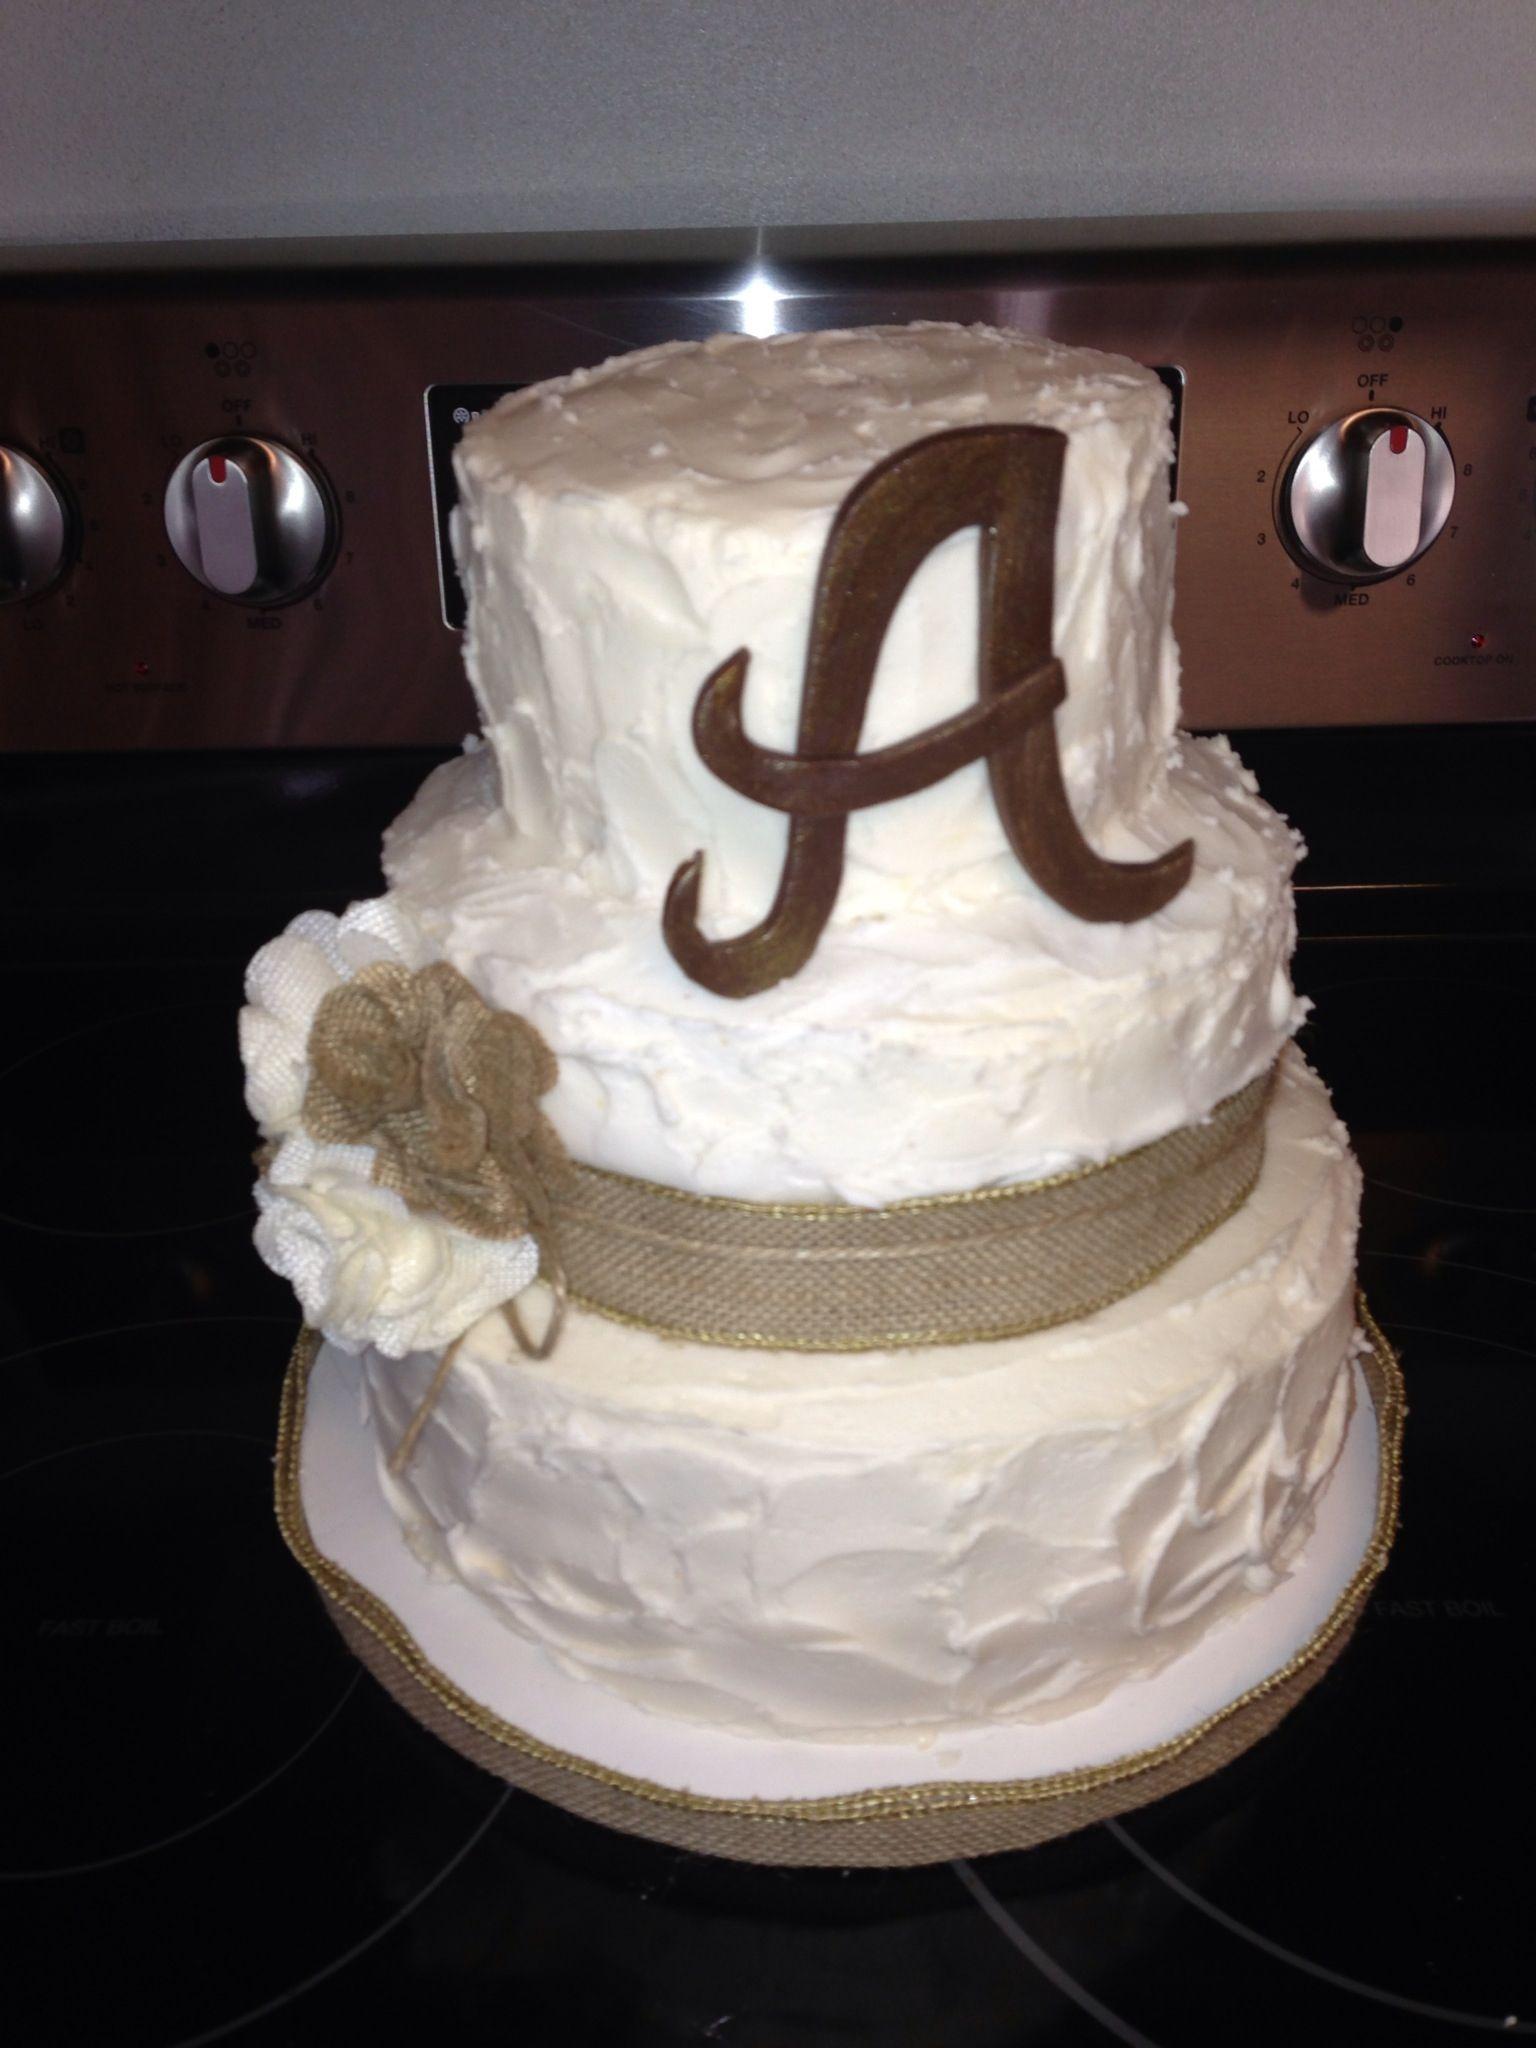 wedding shower burlap cake cakes pinterest burlap cake cake and weddings. Black Bedroom Furniture Sets. Home Design Ideas